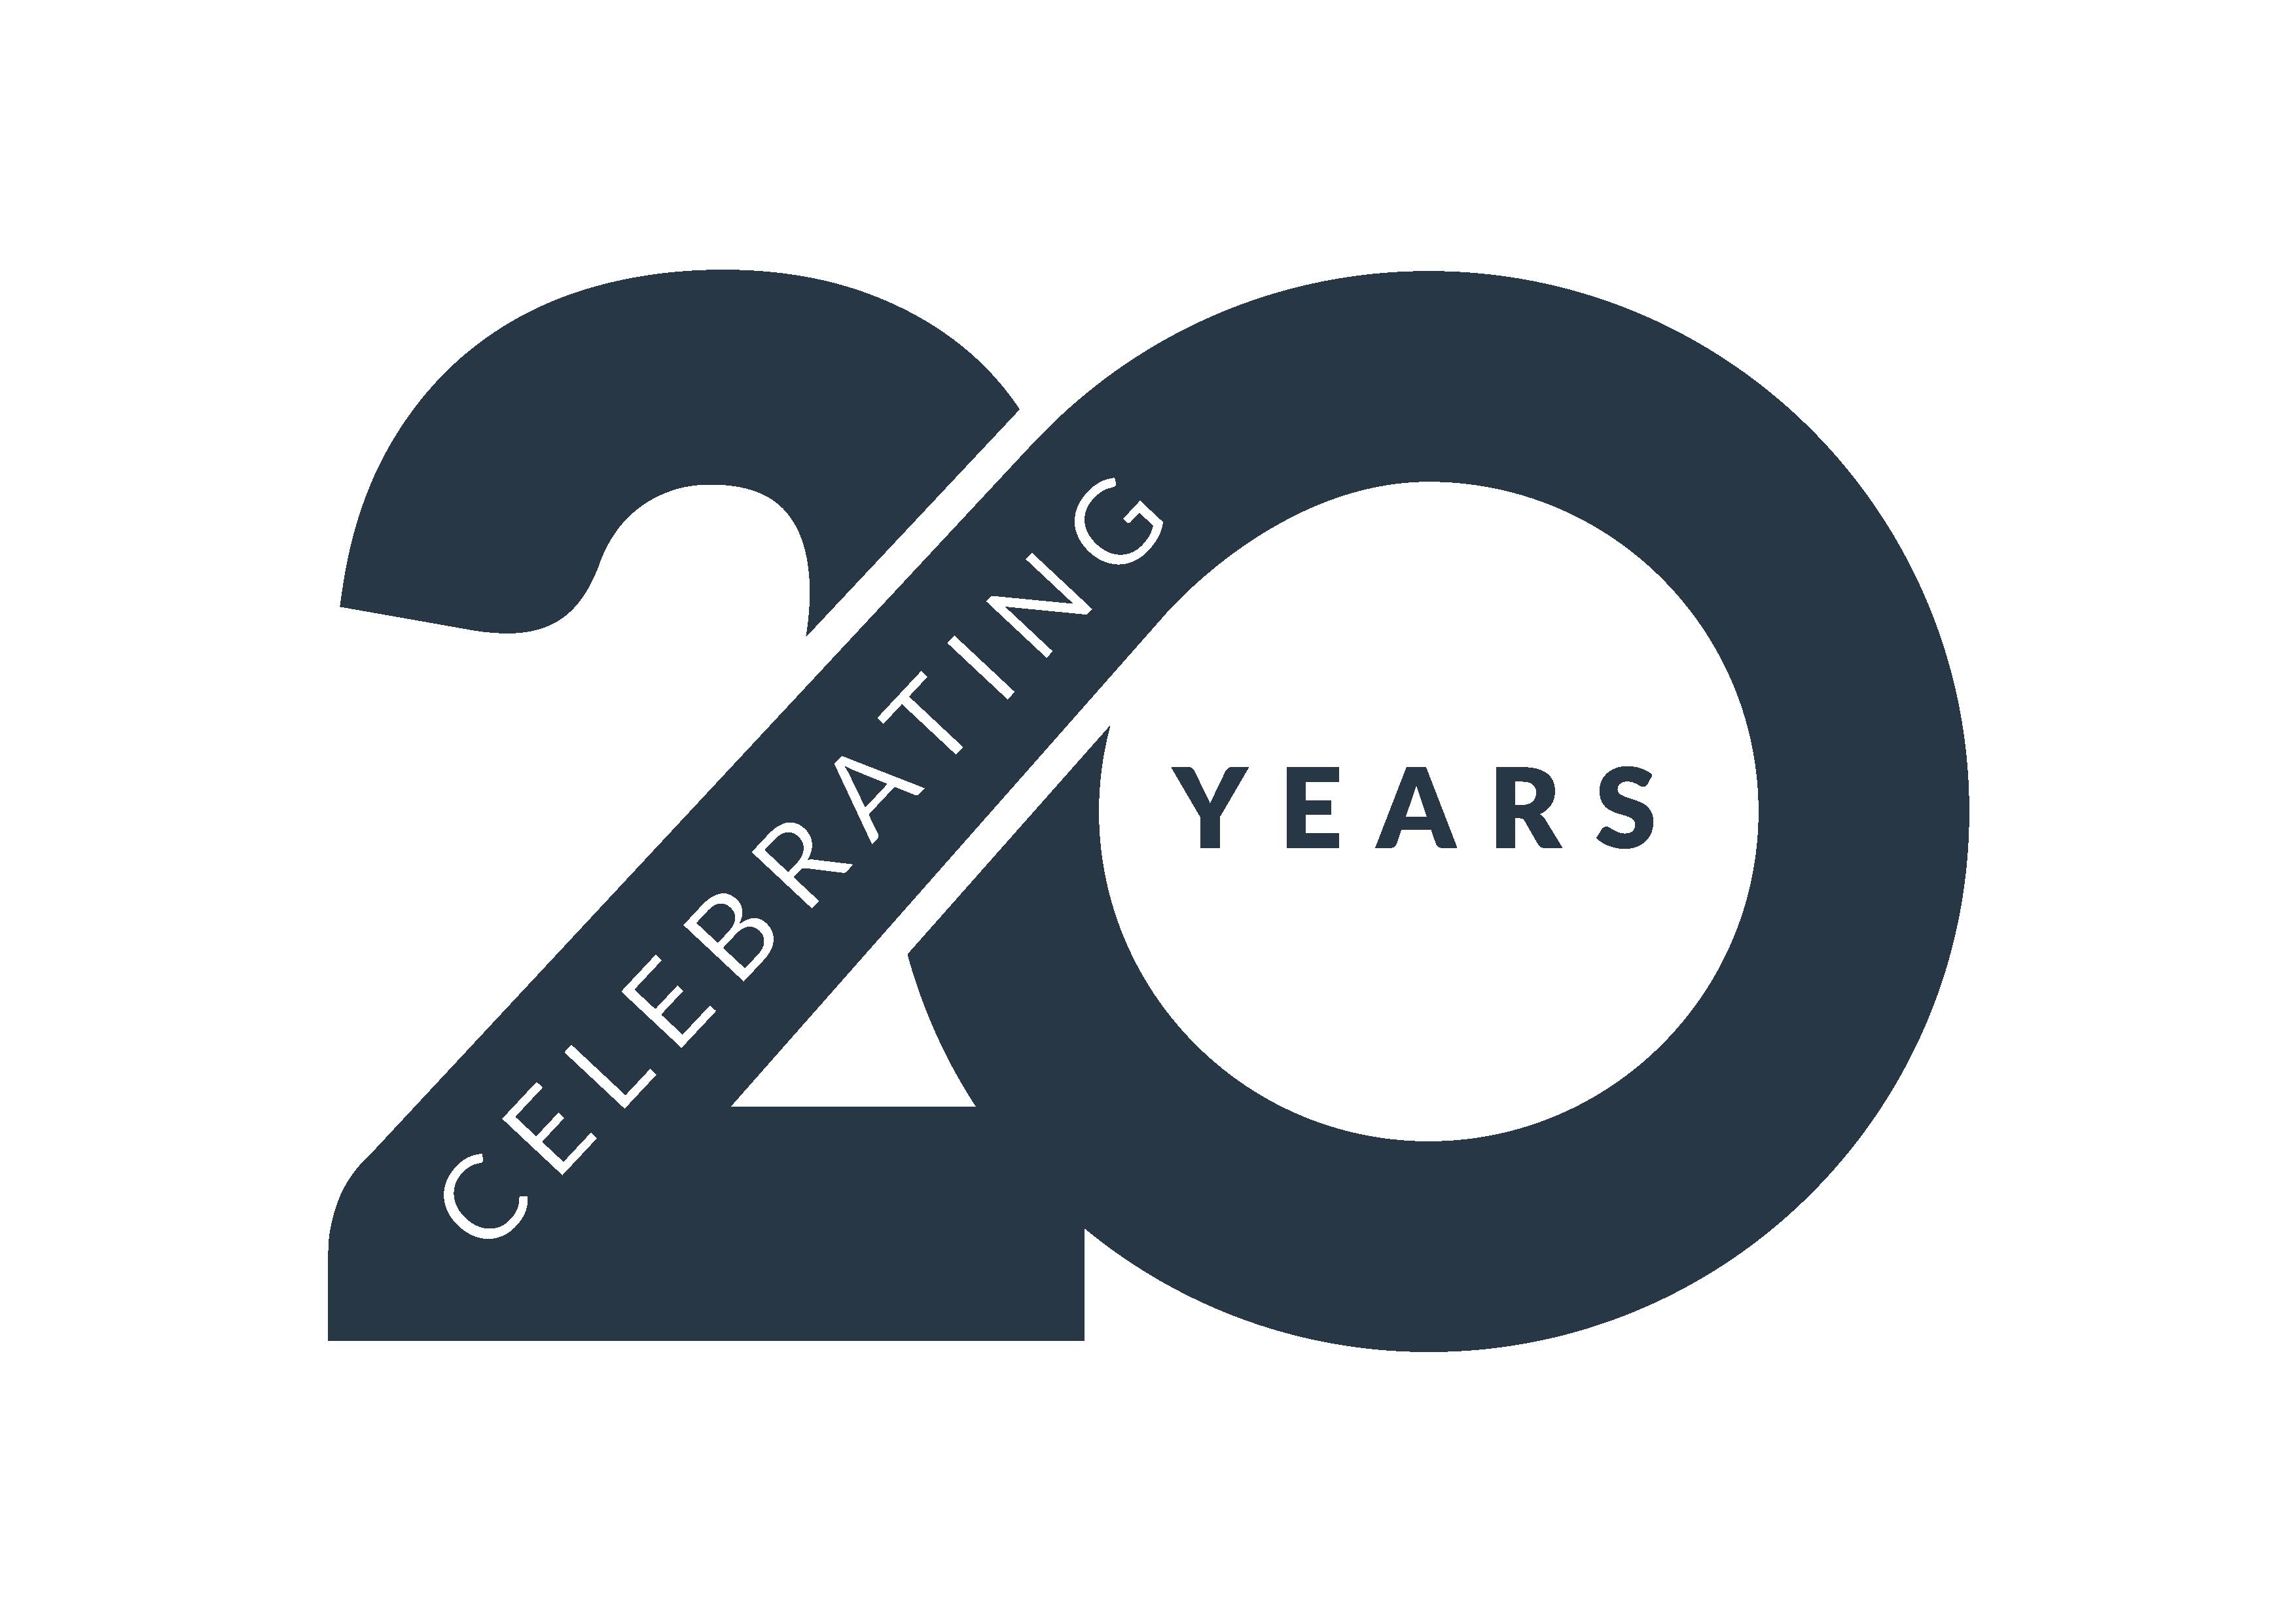 Advanced Eye Care Celebrated 20th anniversary